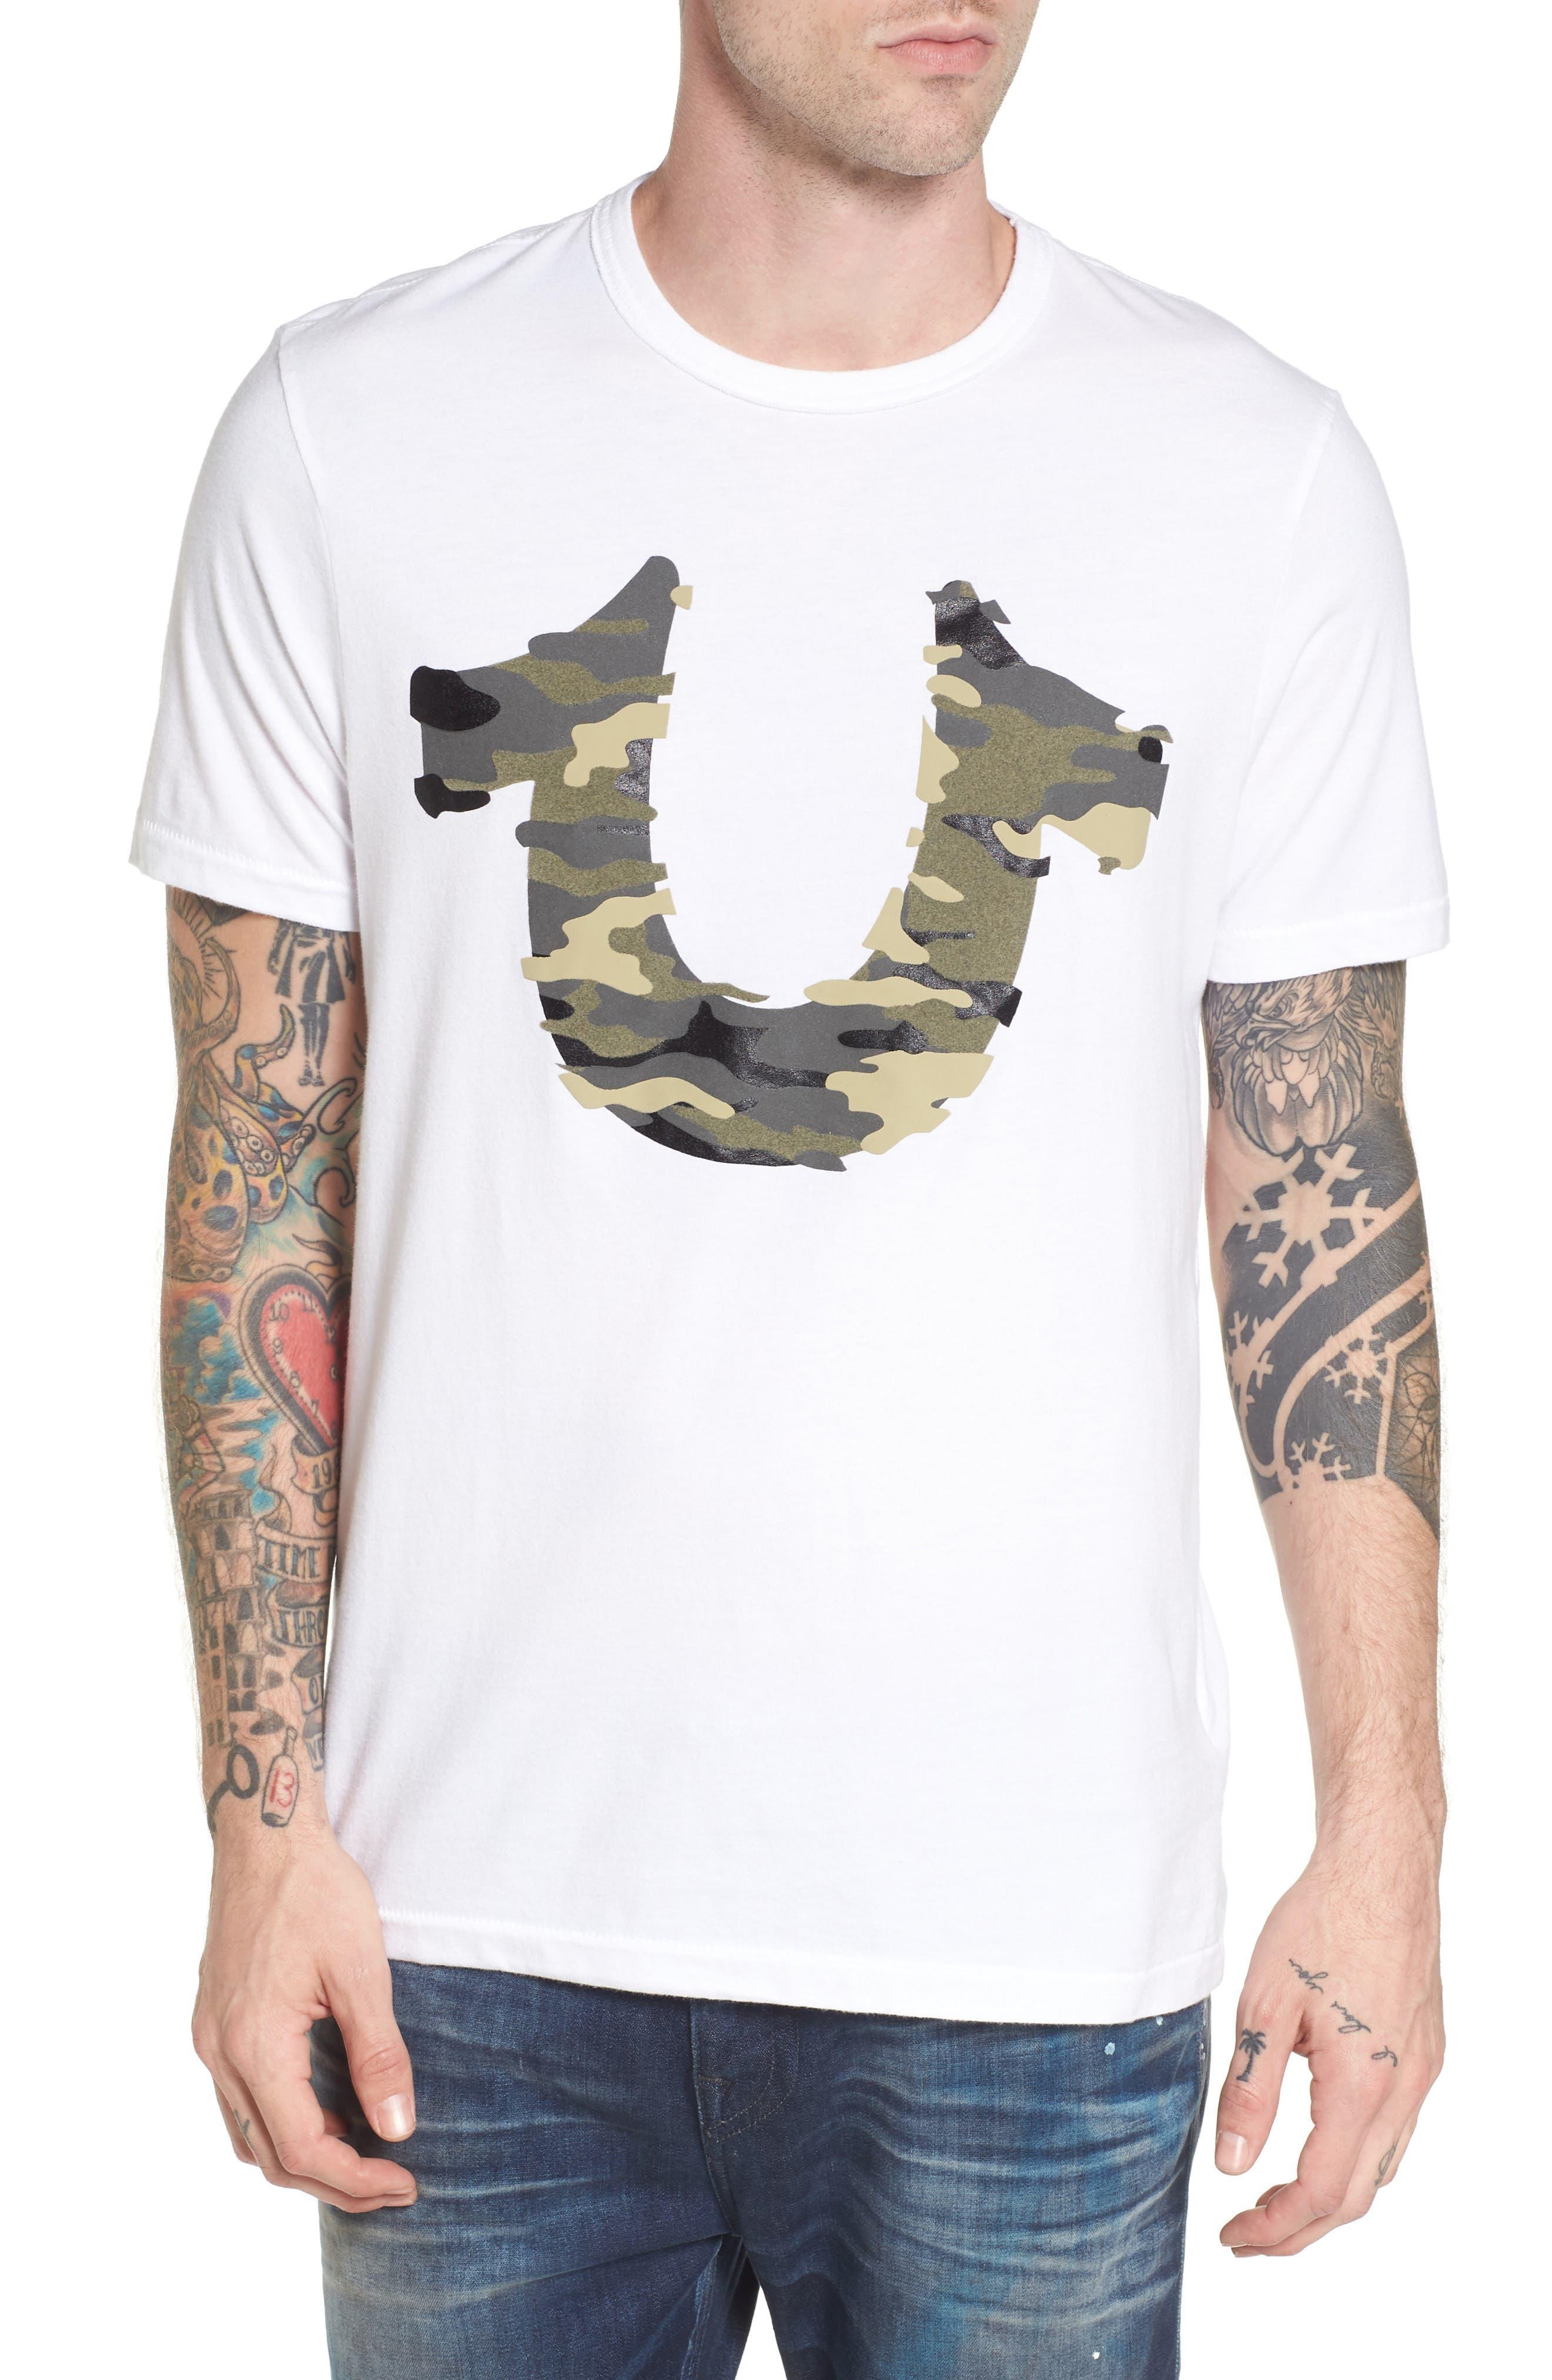 True Religion Brand Jeans 3D Camo Graphic T-Shirt